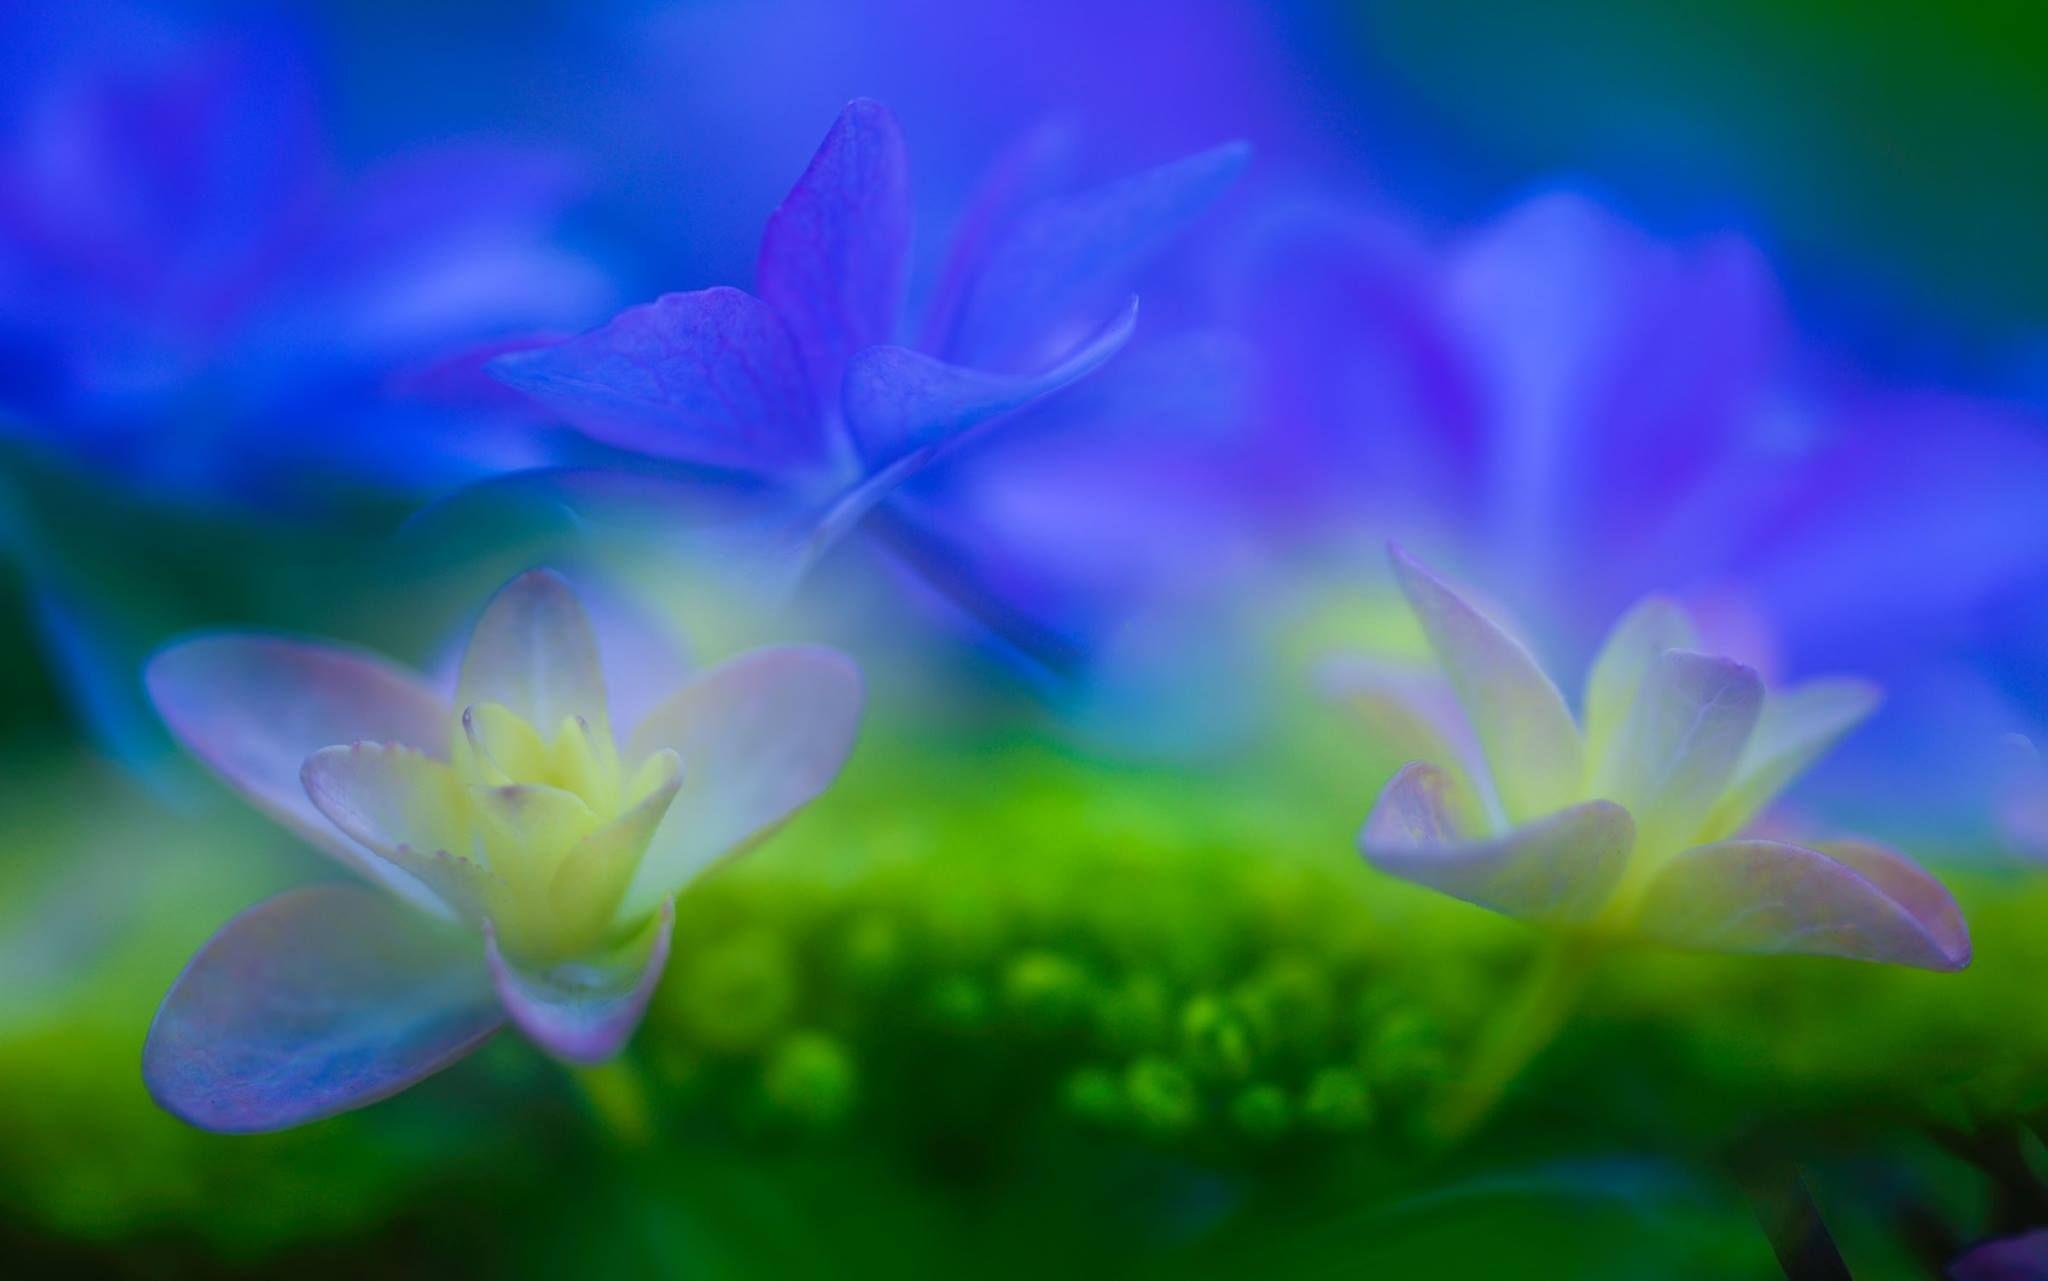 Photo by Yasuo Hirano